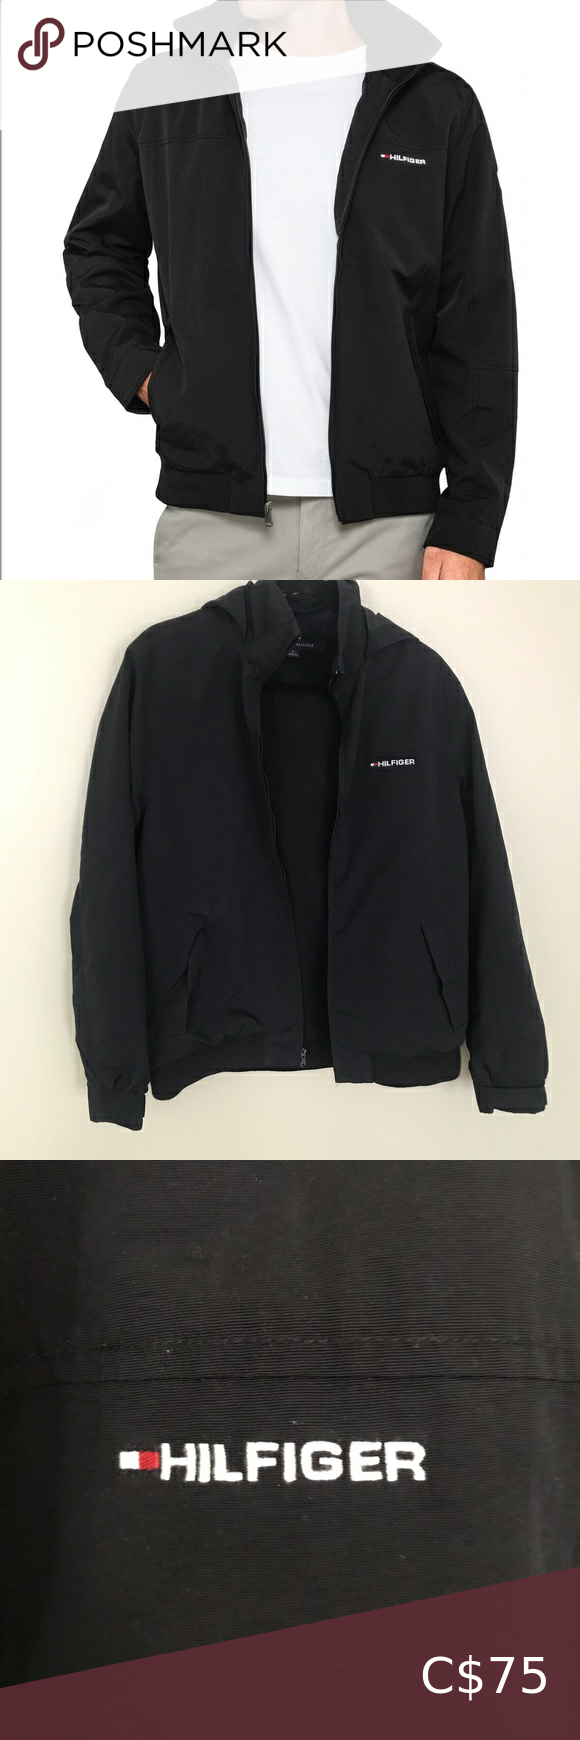 Tommy Hilfiger Yachting Jacket Lightly Worn Condition 9 10 Tommy Hilfiger Jackets Coats Tommy Hilfiger Jackets Clothes Design Hilfiger [ 1740 x 580 Pixel ]